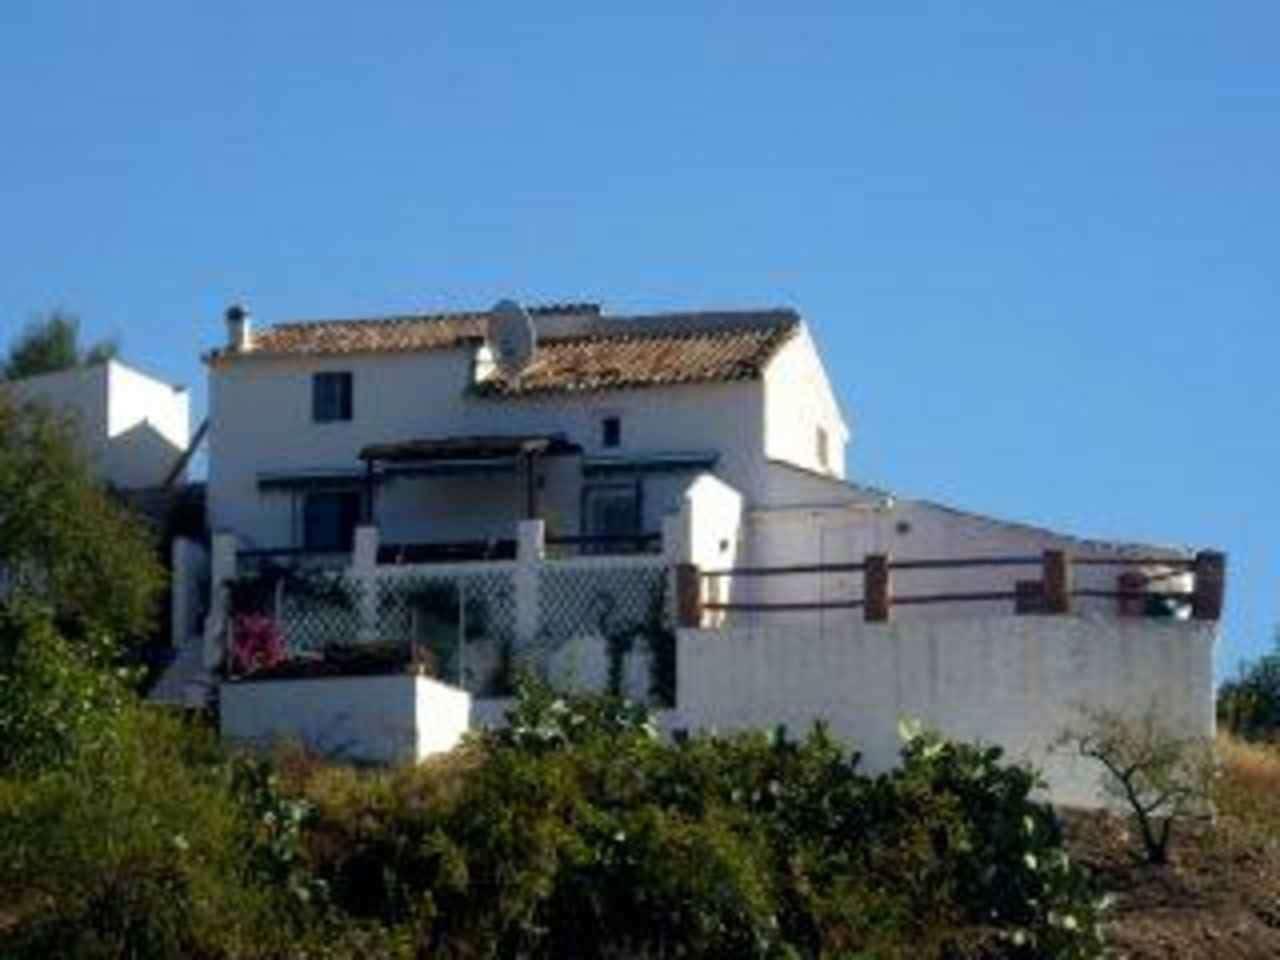 3 bedroom Finca/Country House for sale in Benamargosa - € 170,000 (Ref: 3146340)